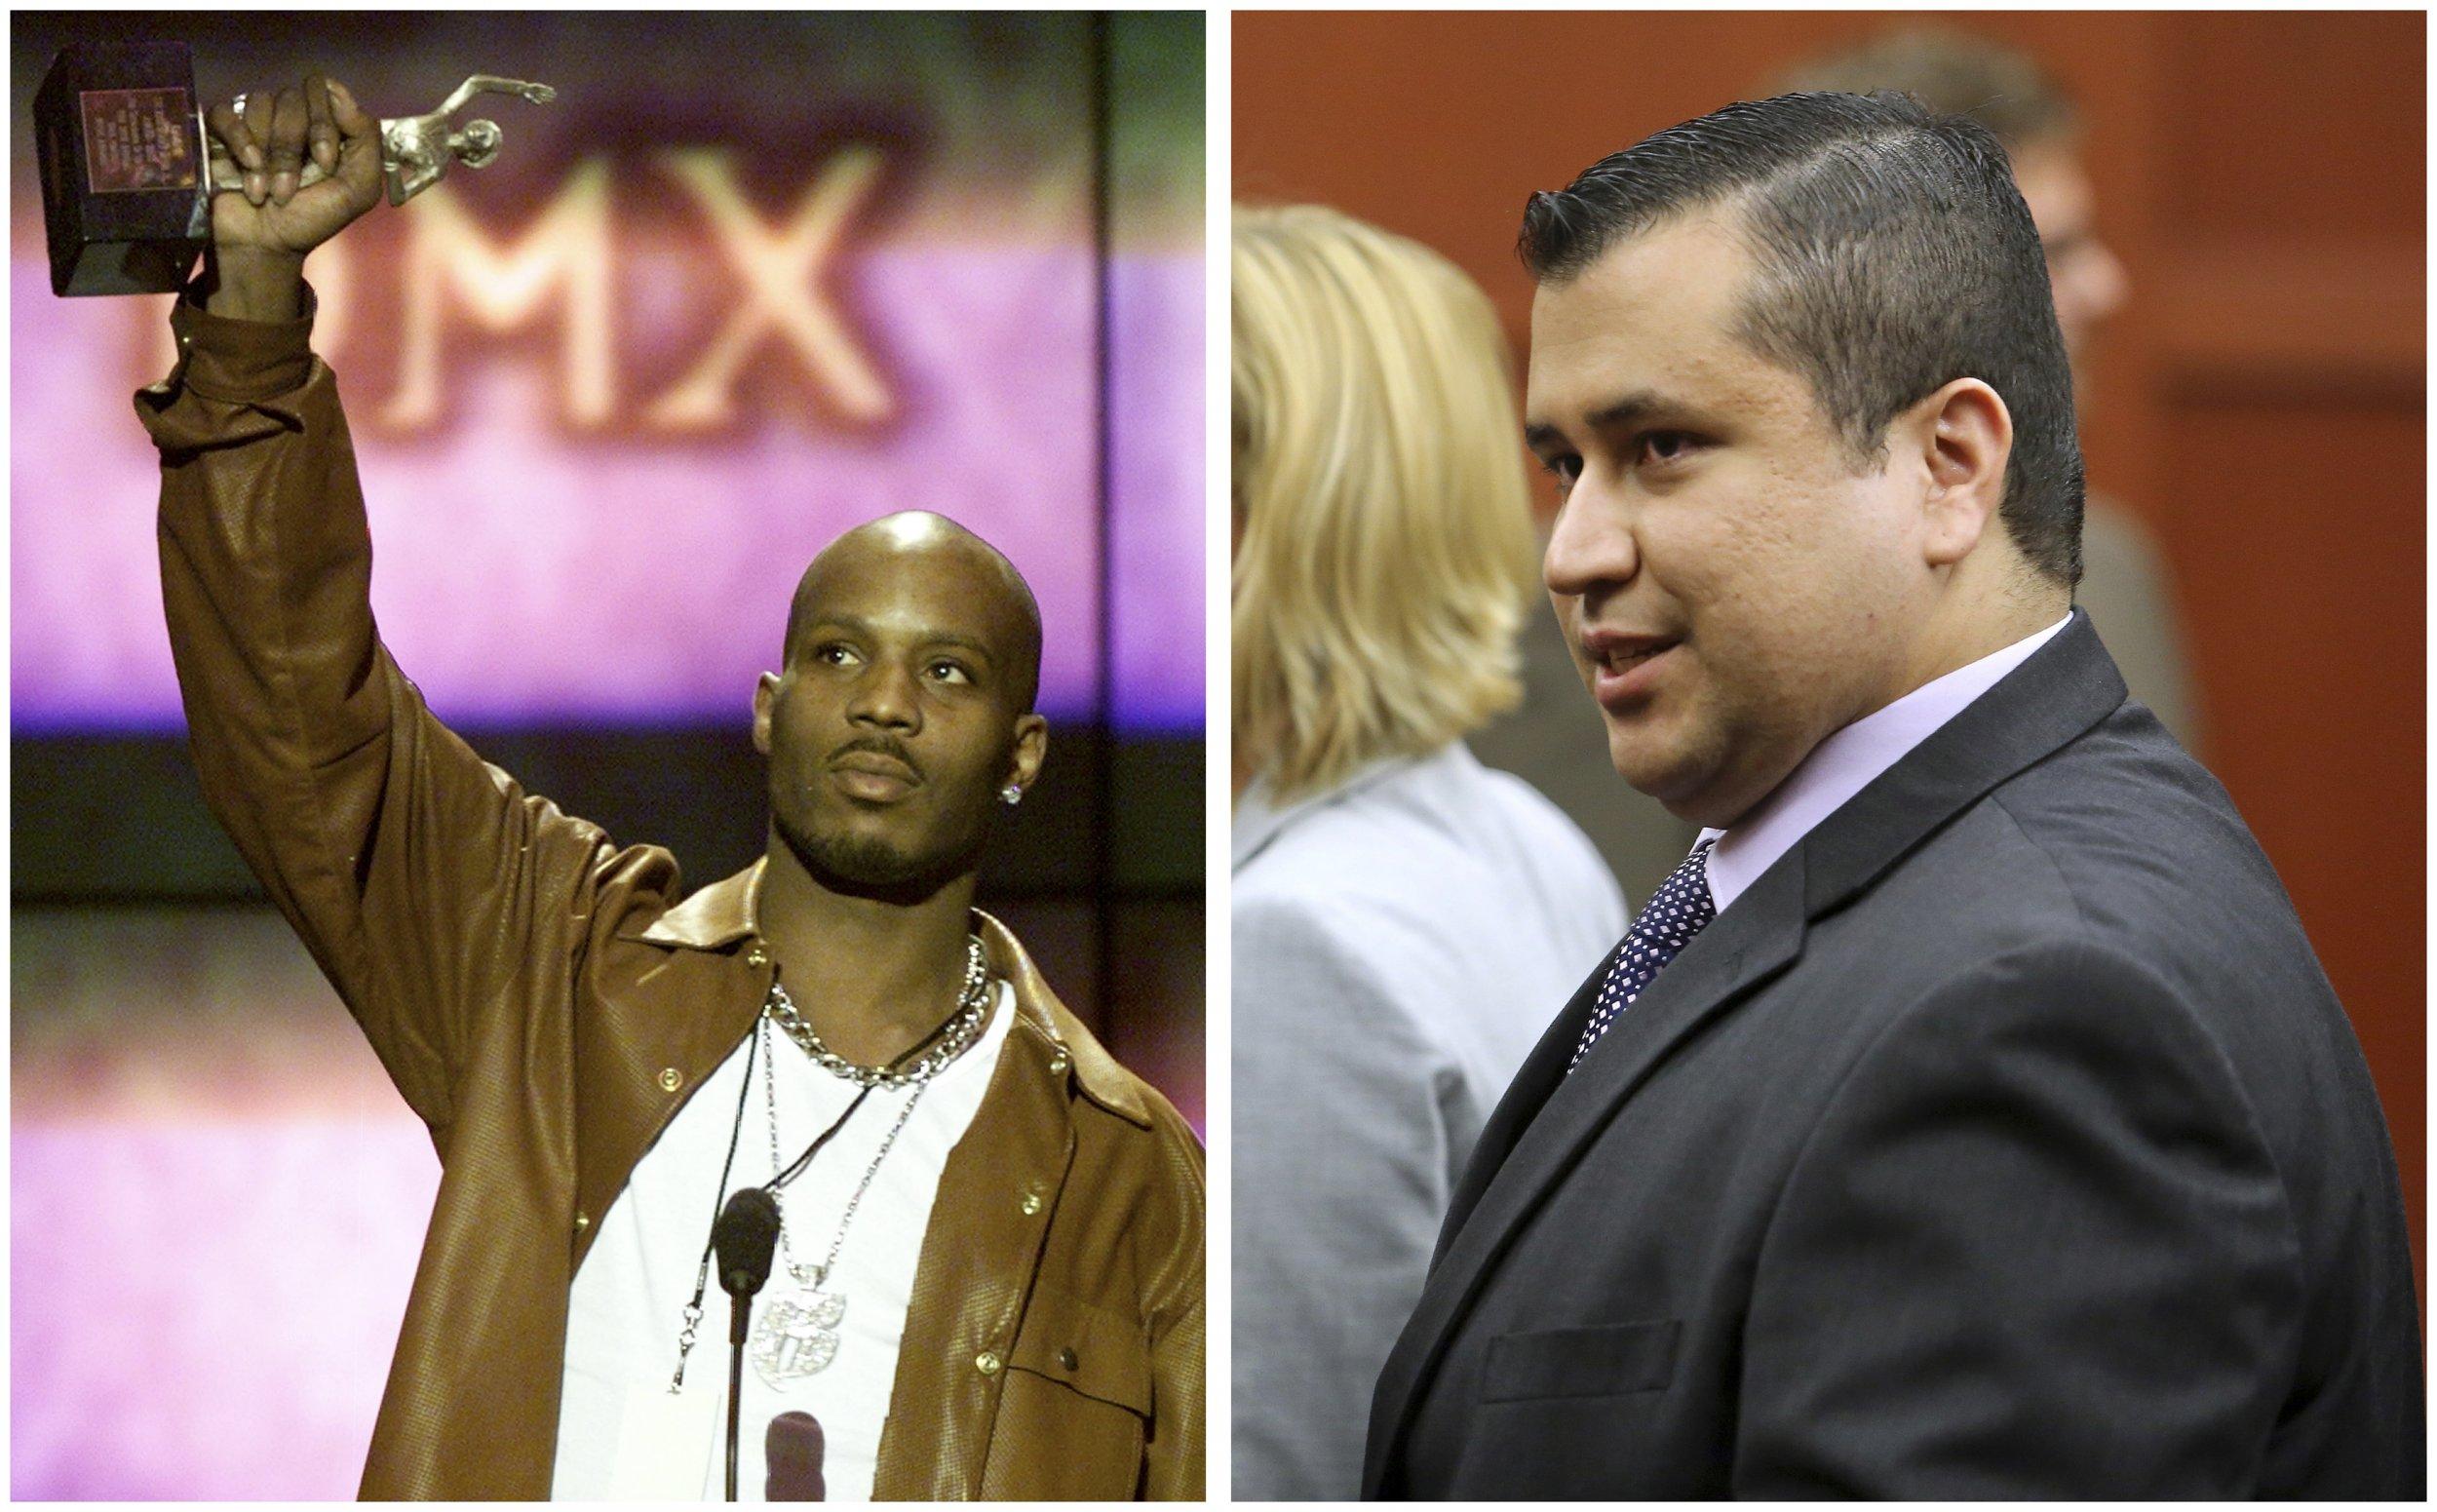 Trayvon martin celebrity supporters